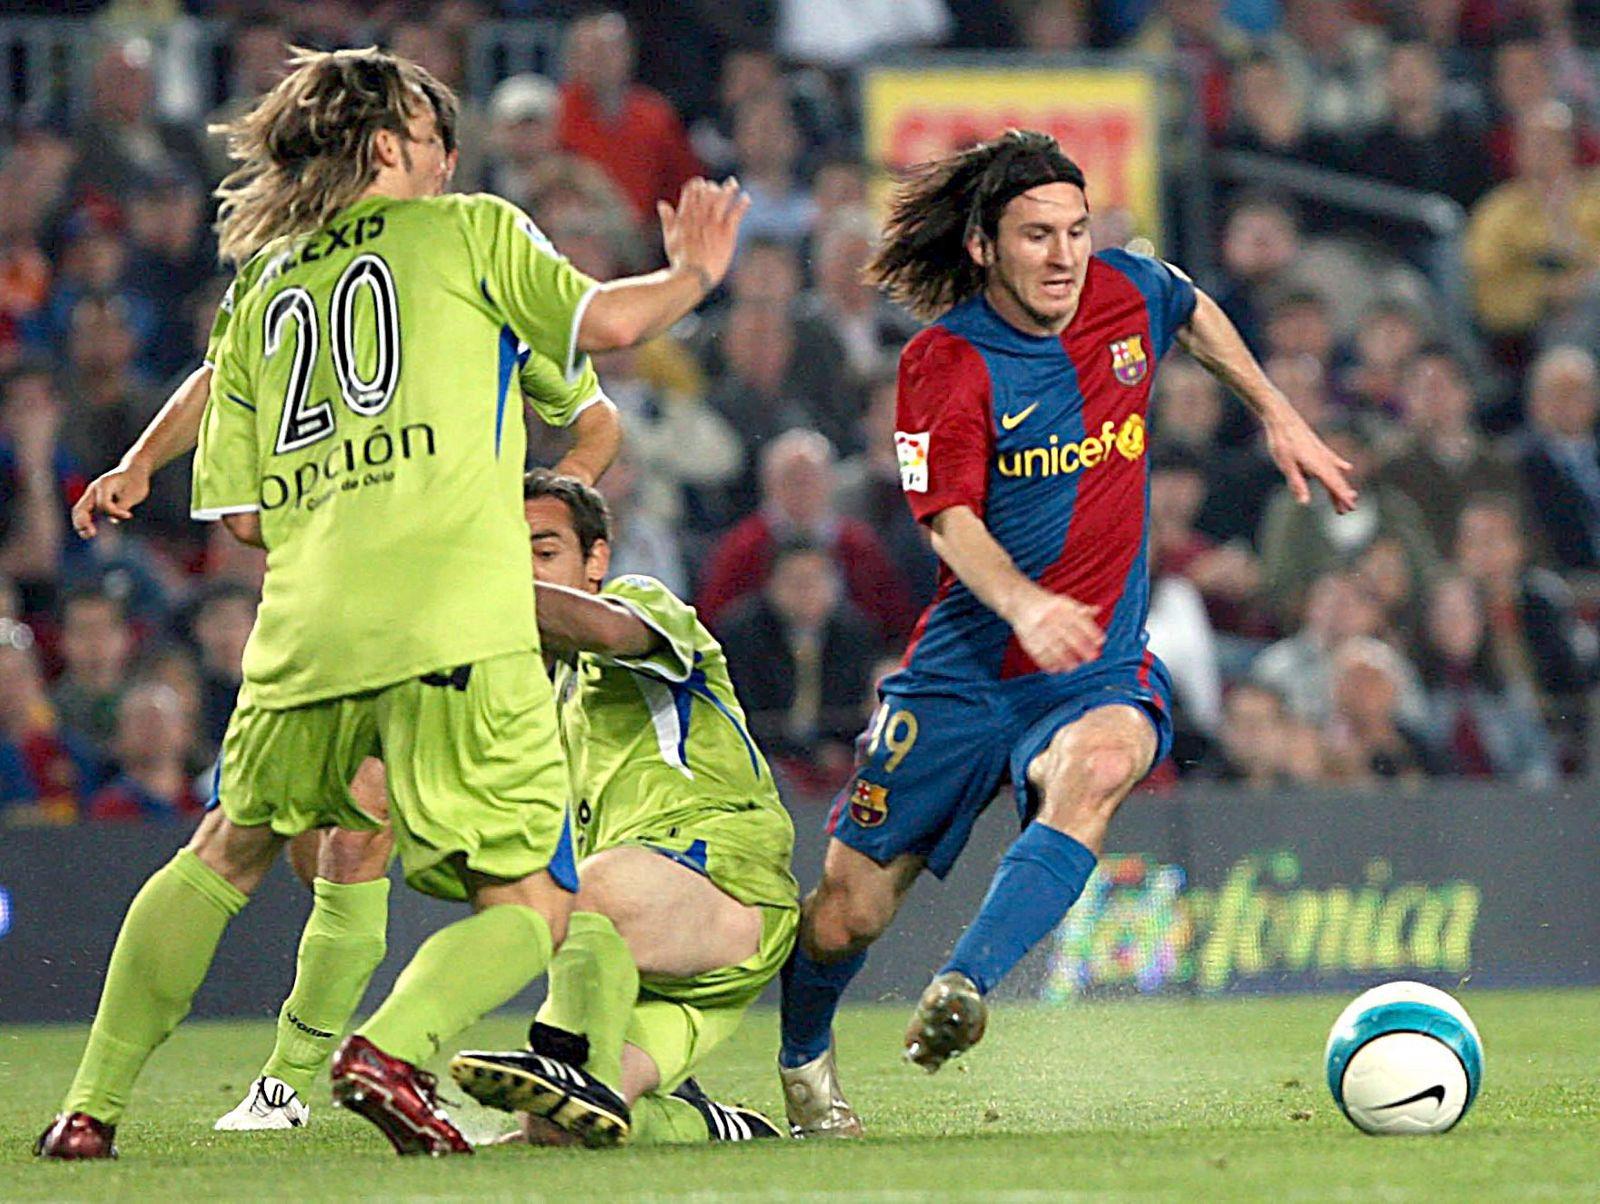 Copa del Rey - FC Barcelona - Getafe 5:2